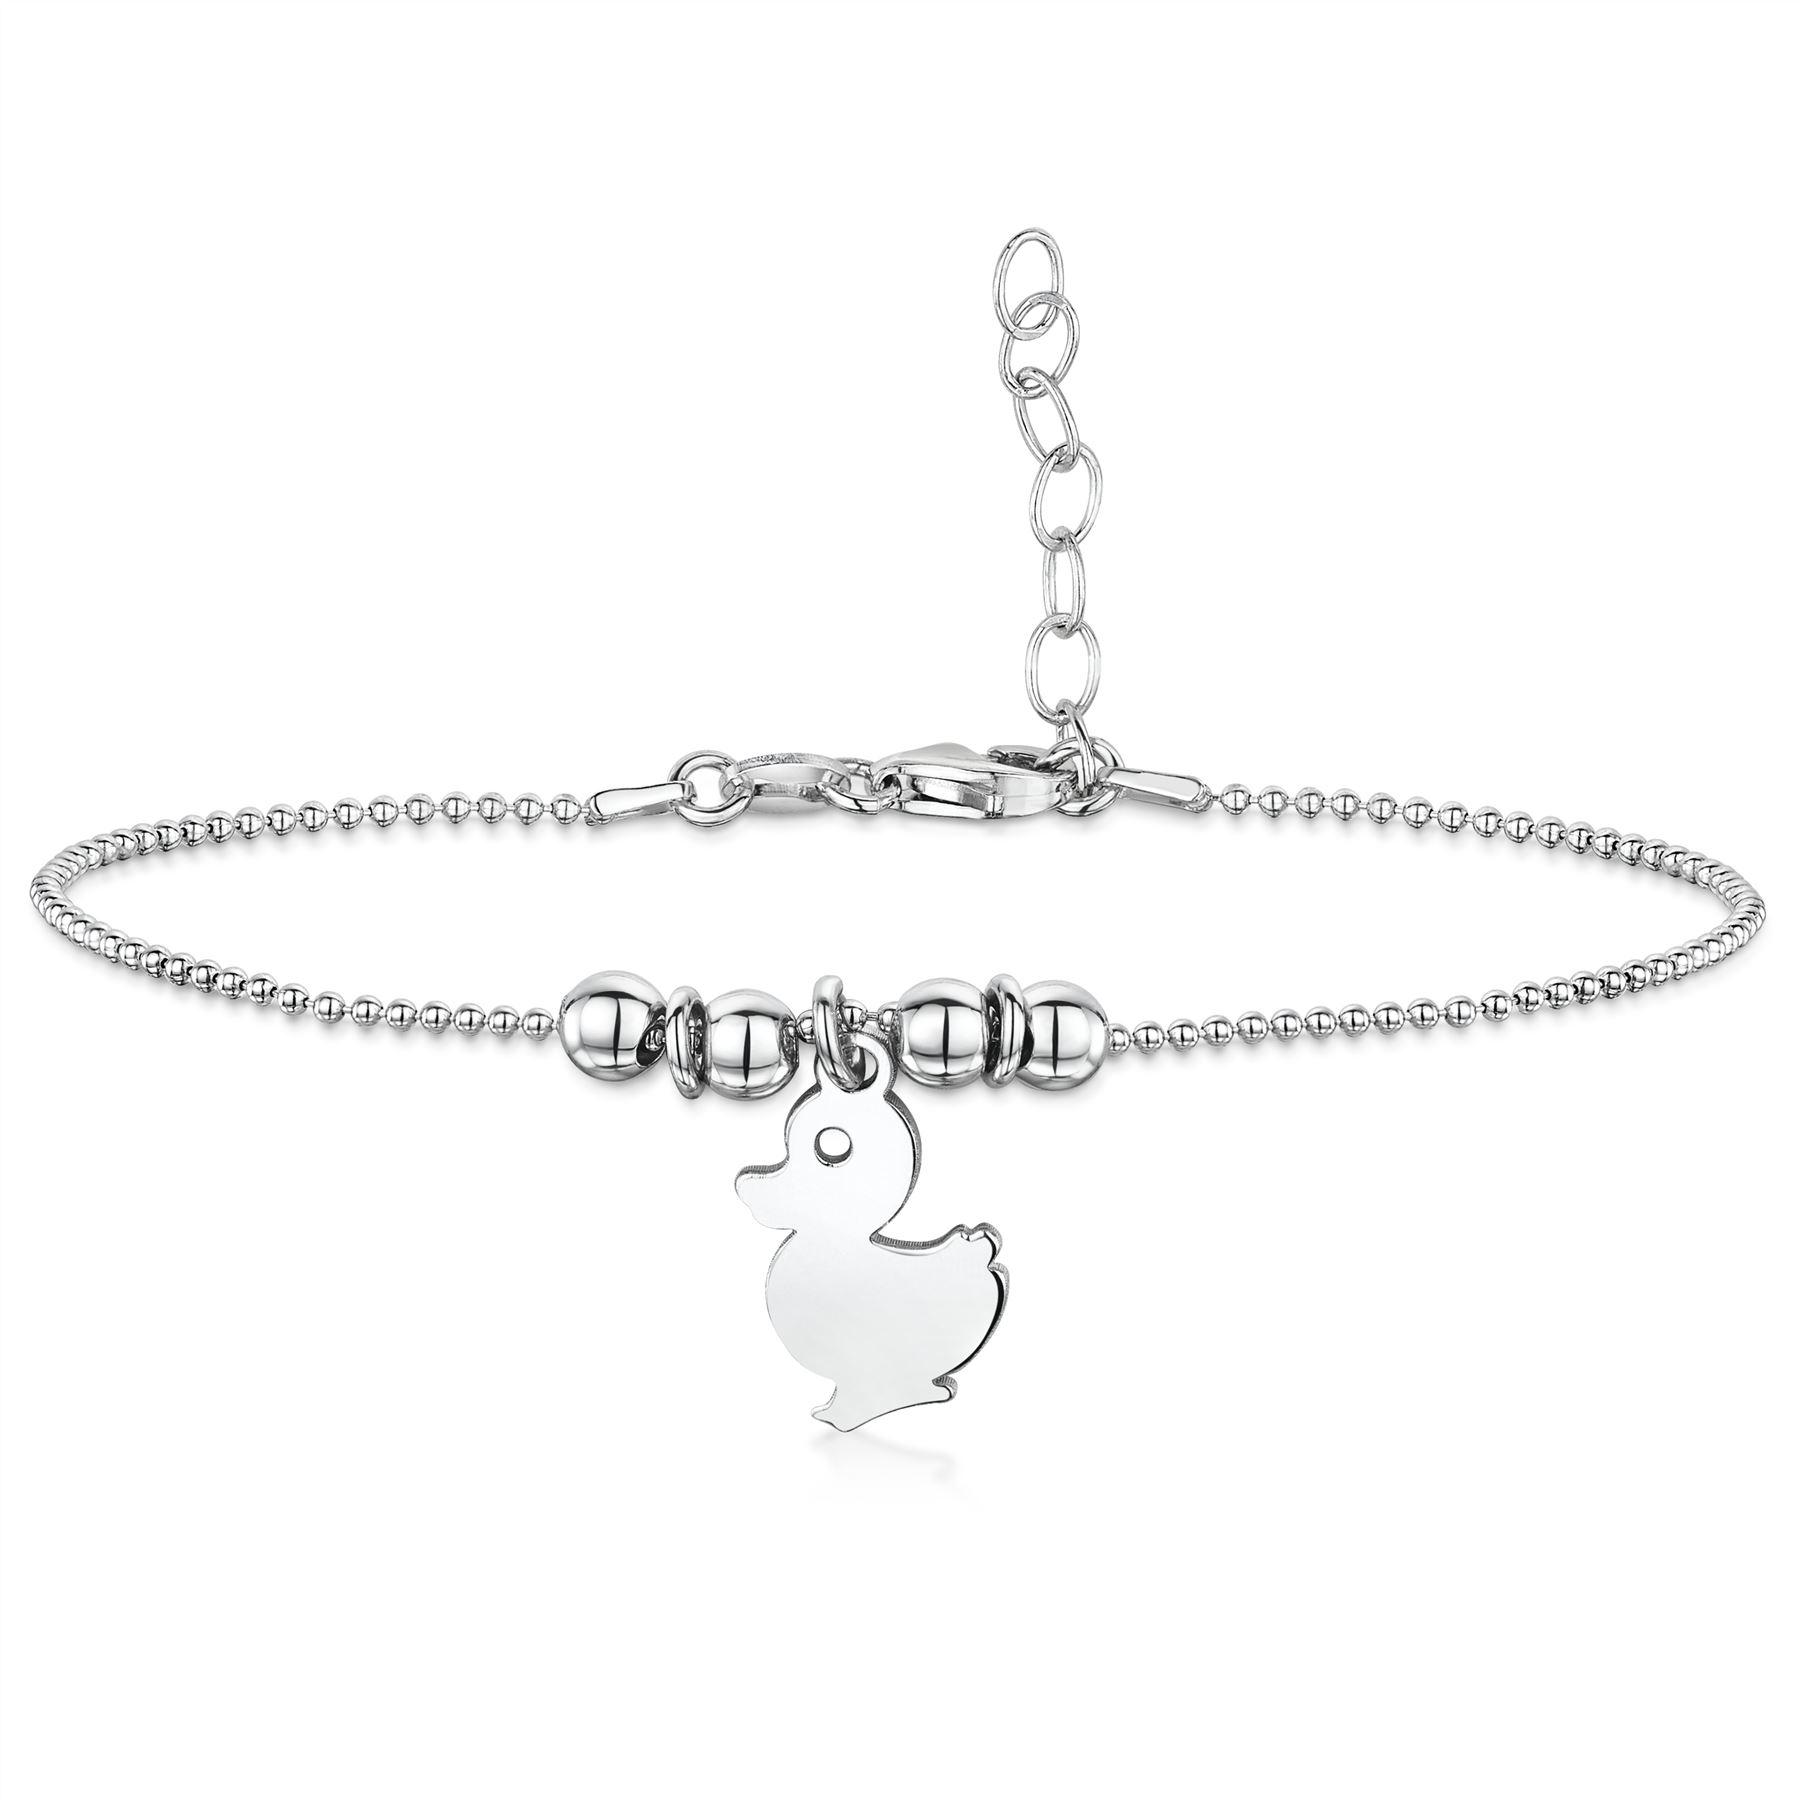 Amberta-Jewelry-925-Sterling-Silver-Adjustable-Bracelet-Italian-Bangle-for-Women thumbnail 21